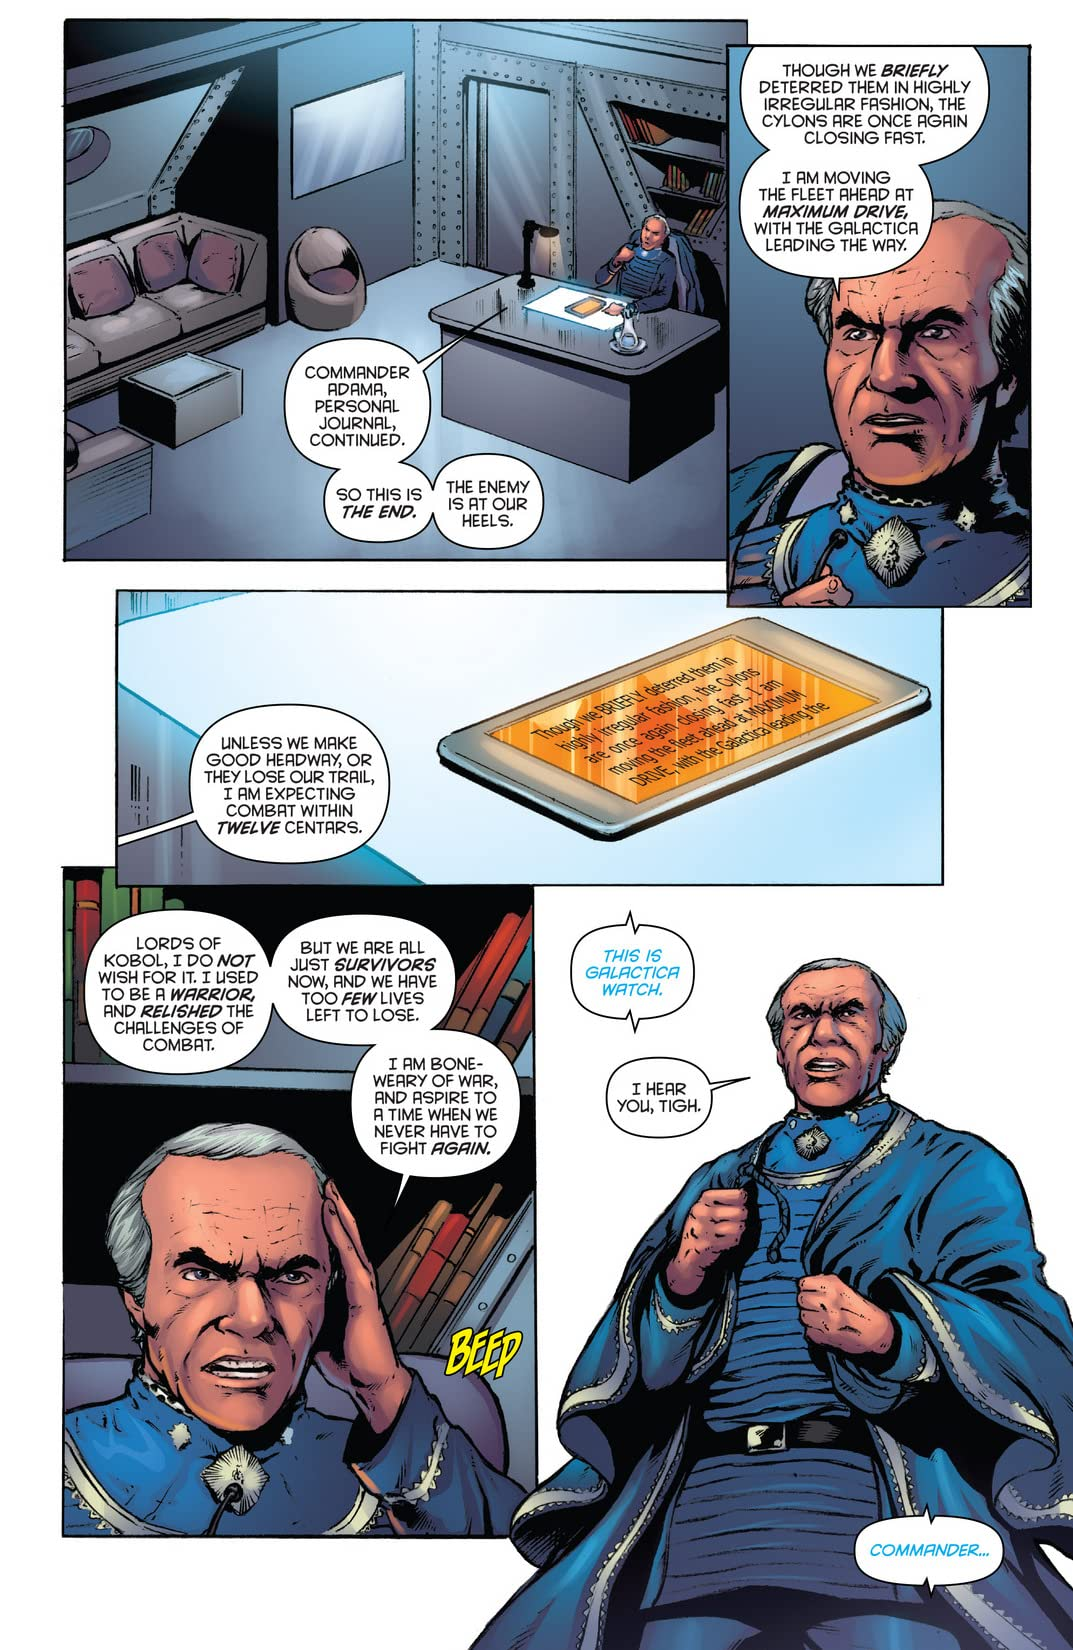 Classic Battlestar Galactica Vol. 2 #10: Digital Exclusive Edition